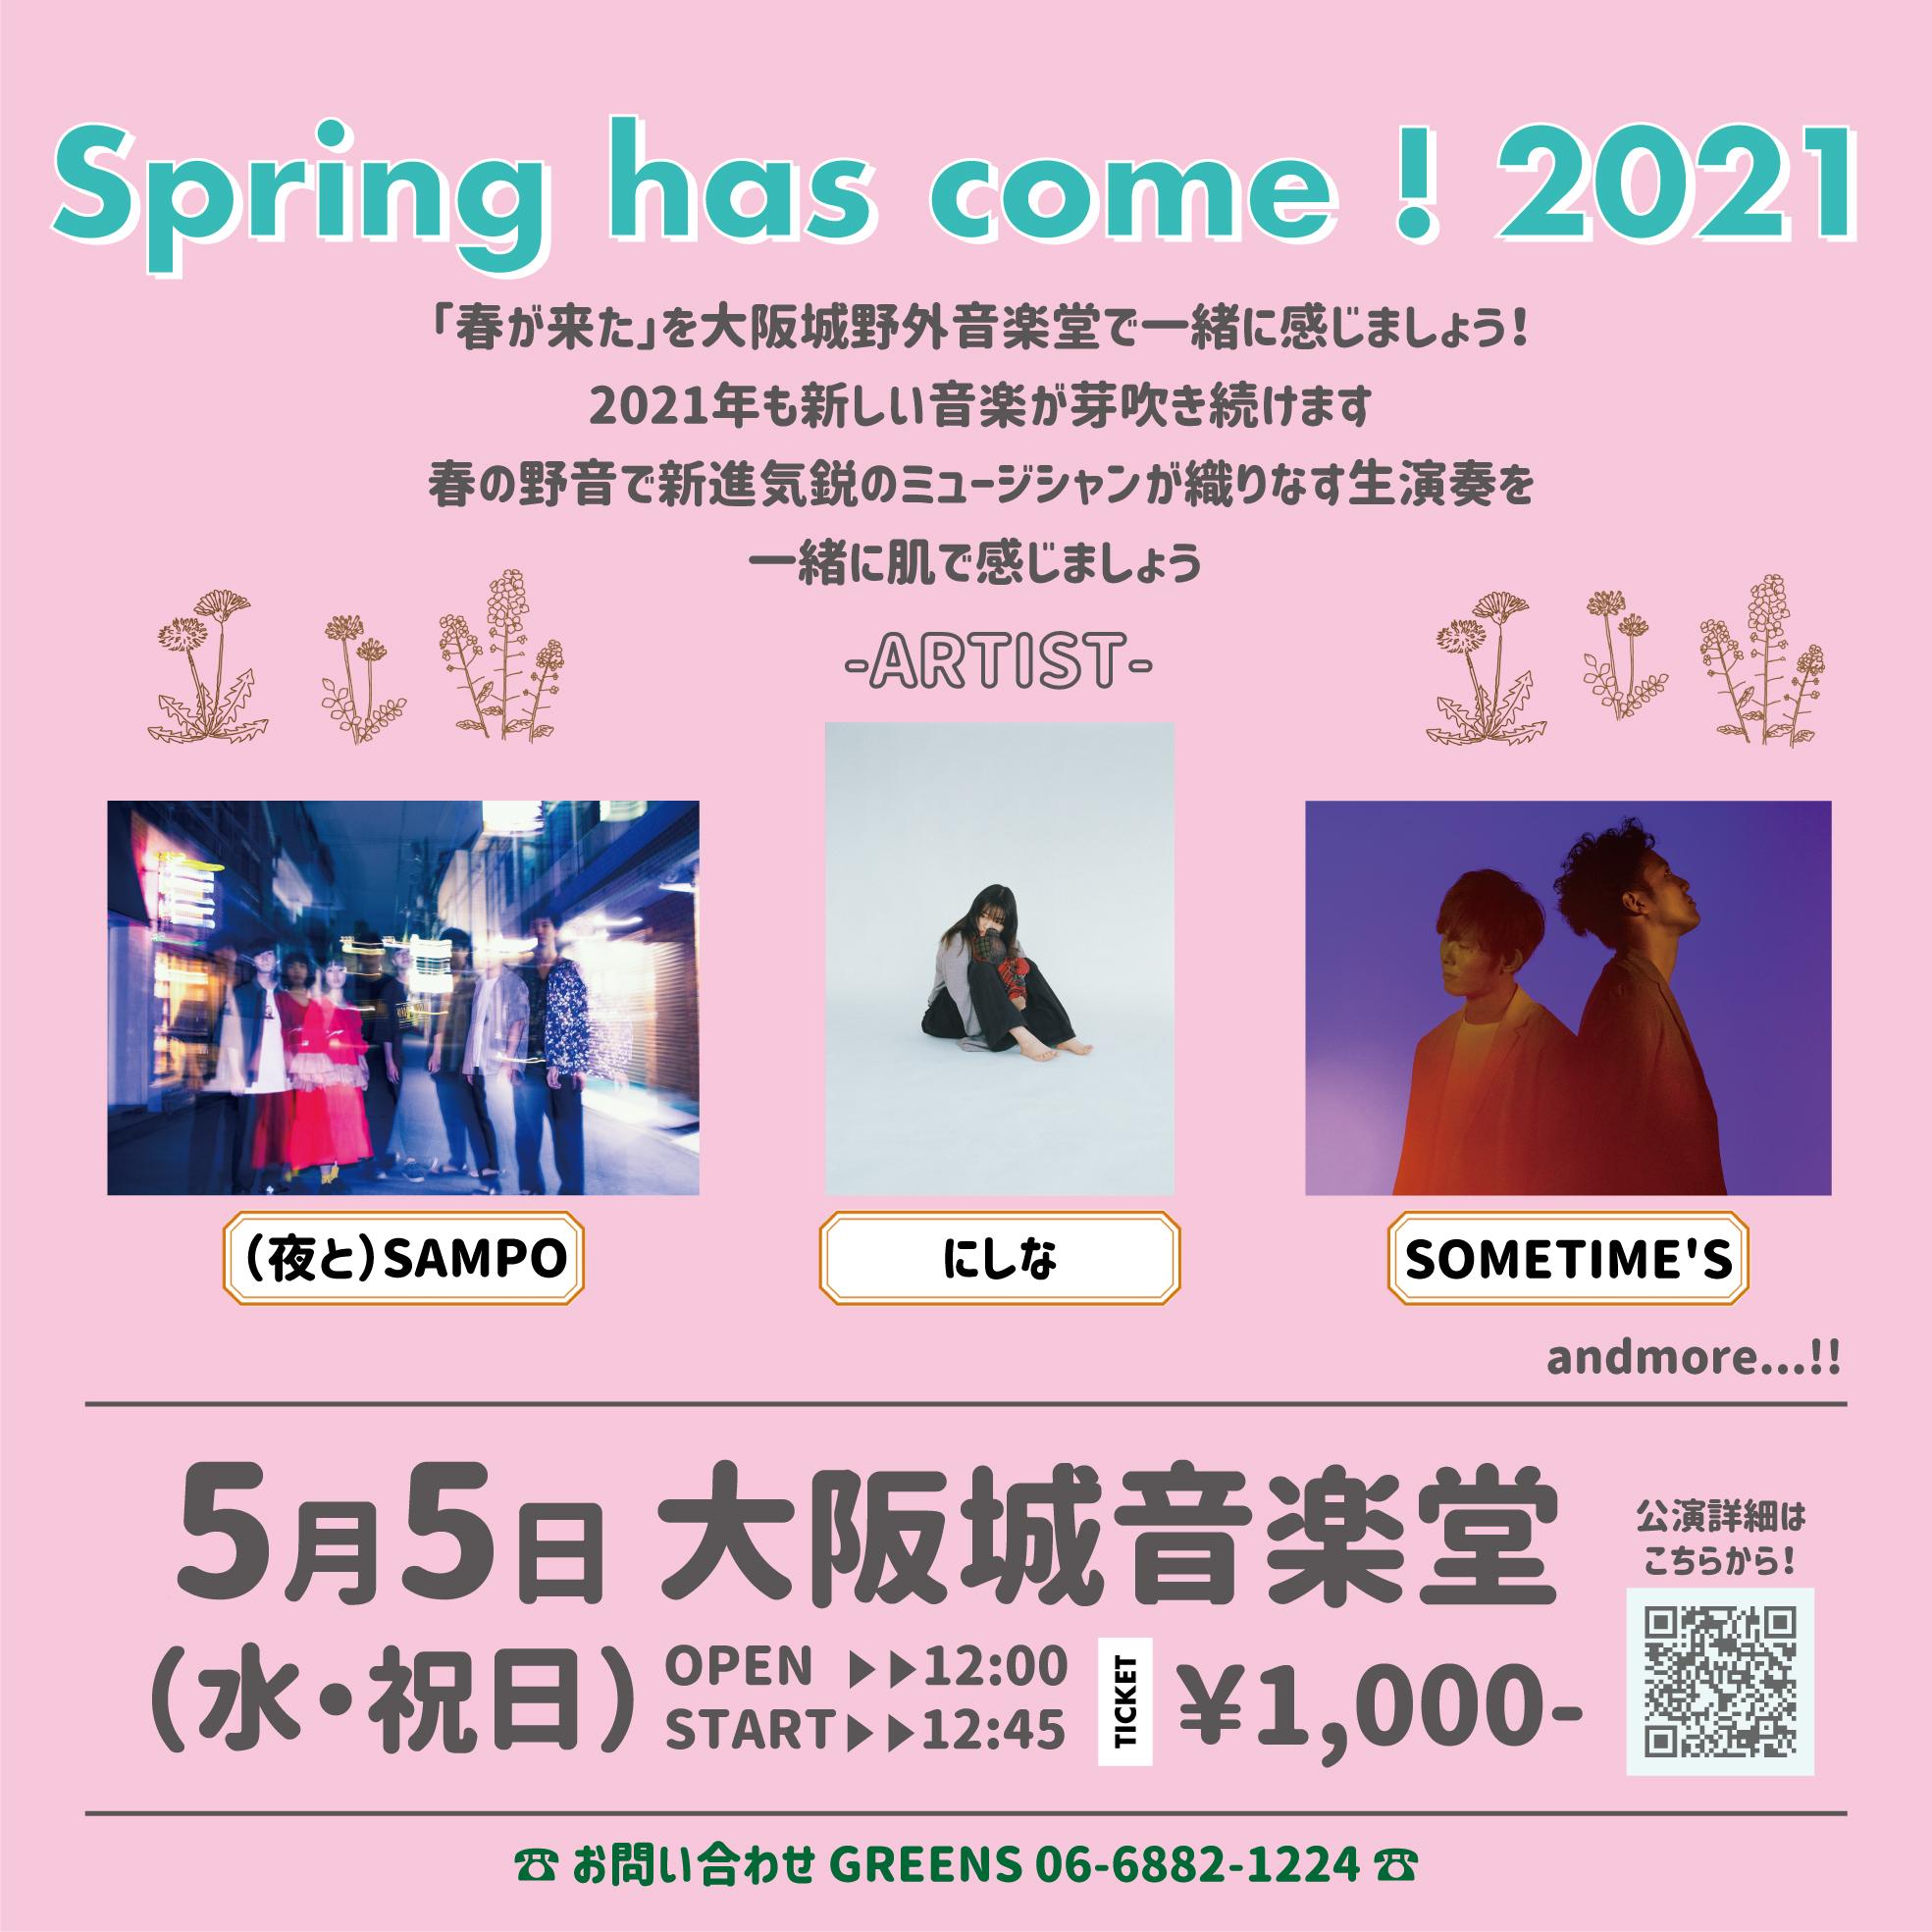 『Spring has come ! 2021 』